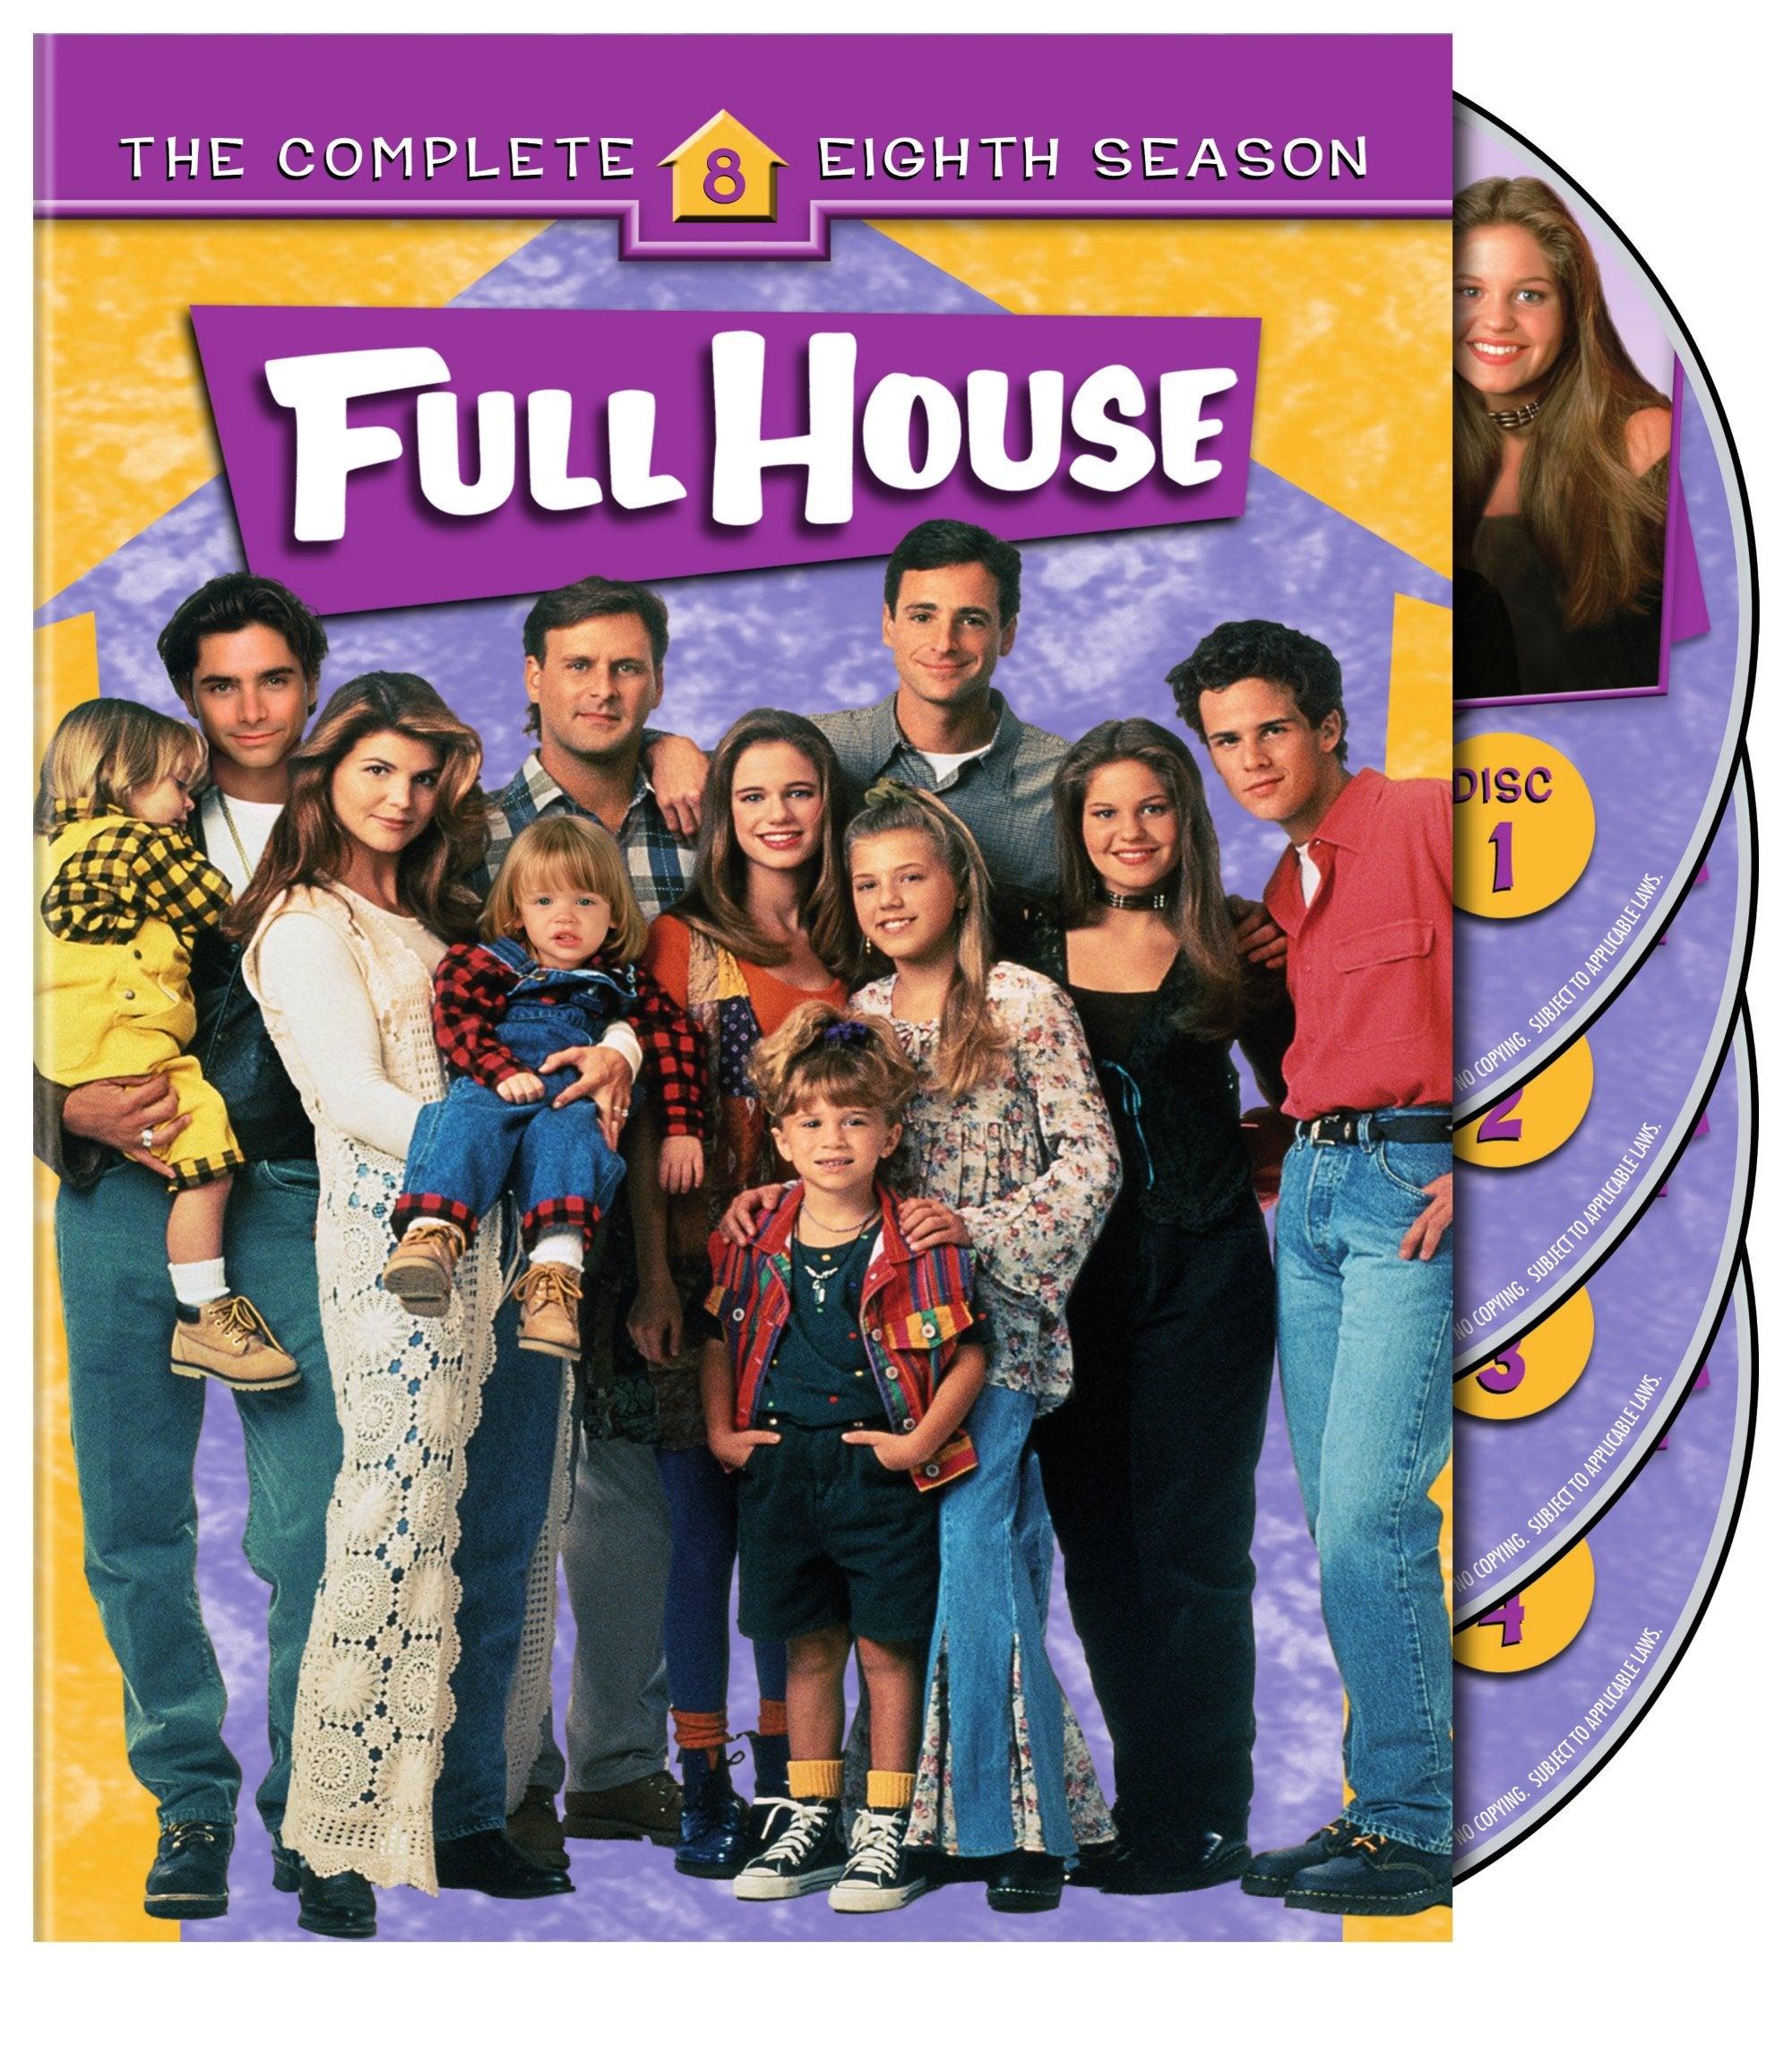 Full House: The Complete Eighth Season (DVD)